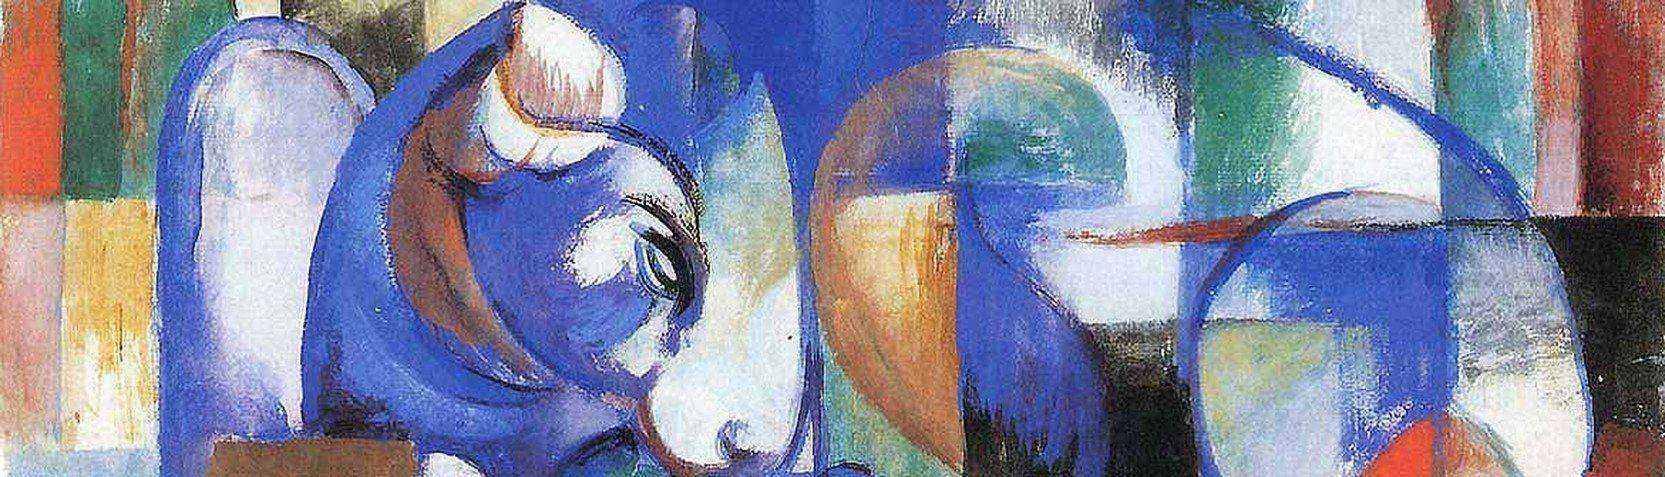 Artistes - Franz Marc